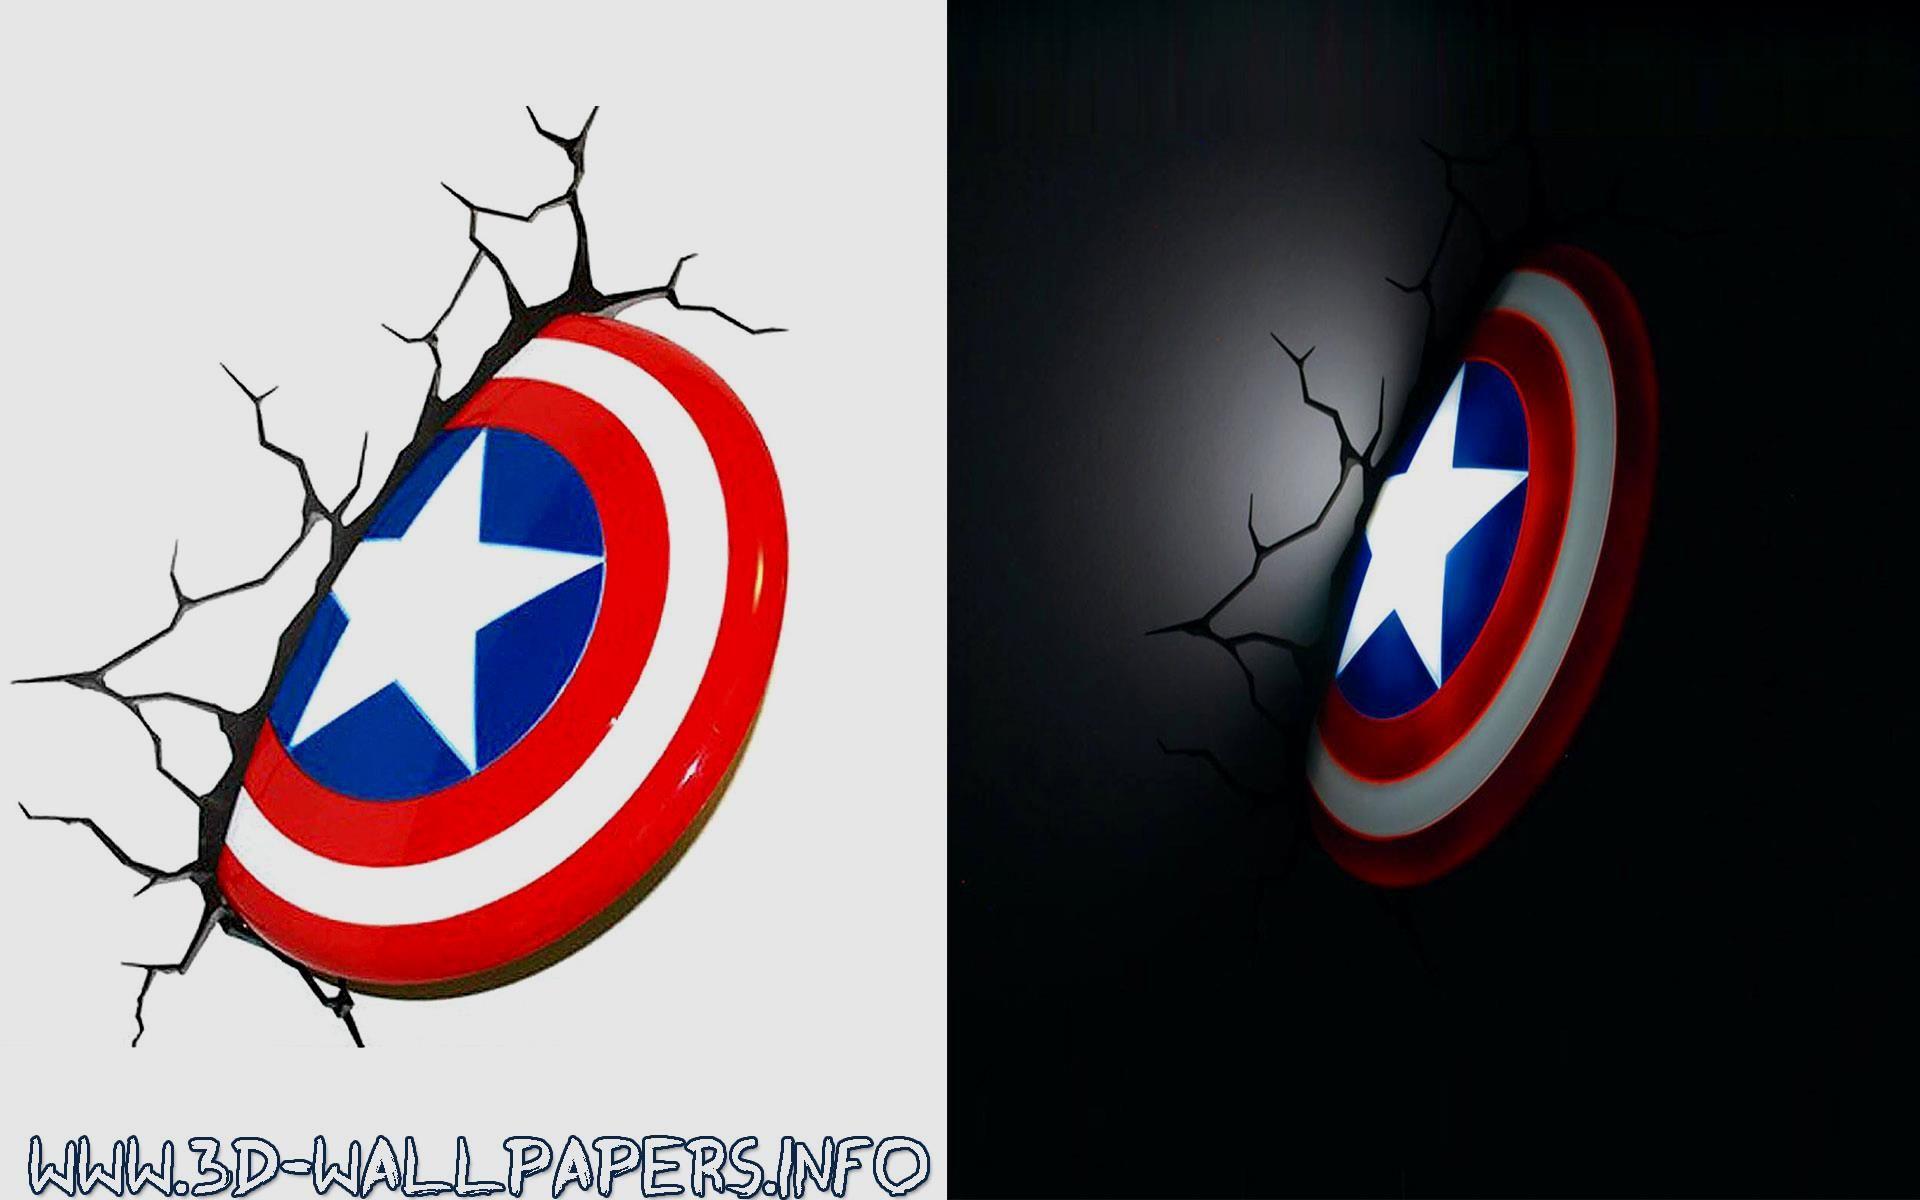 Captain america shield 3d deco led wall light buy it here http captain america shield 3d deco led wall light buy it here aloadofball Images